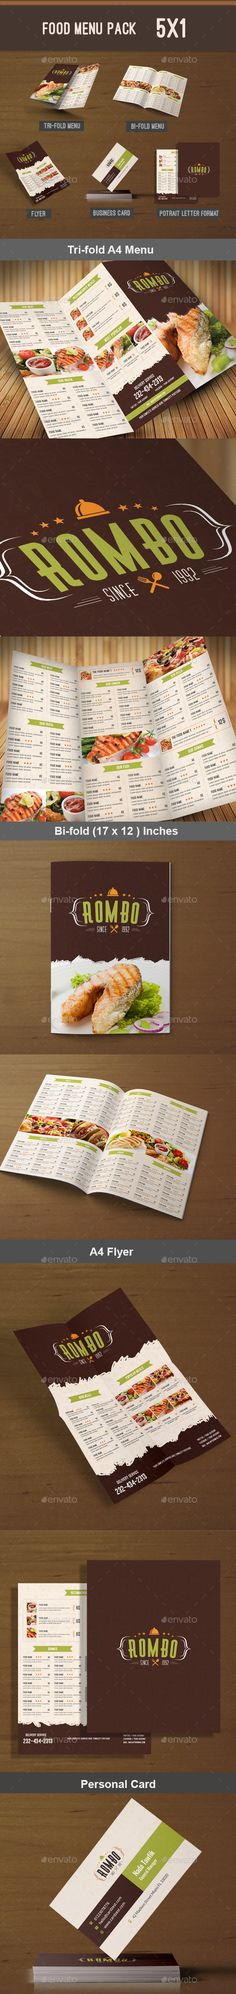 Budget Restaurant Menu Covers £5 | Work | Pinterest | Menu Covers